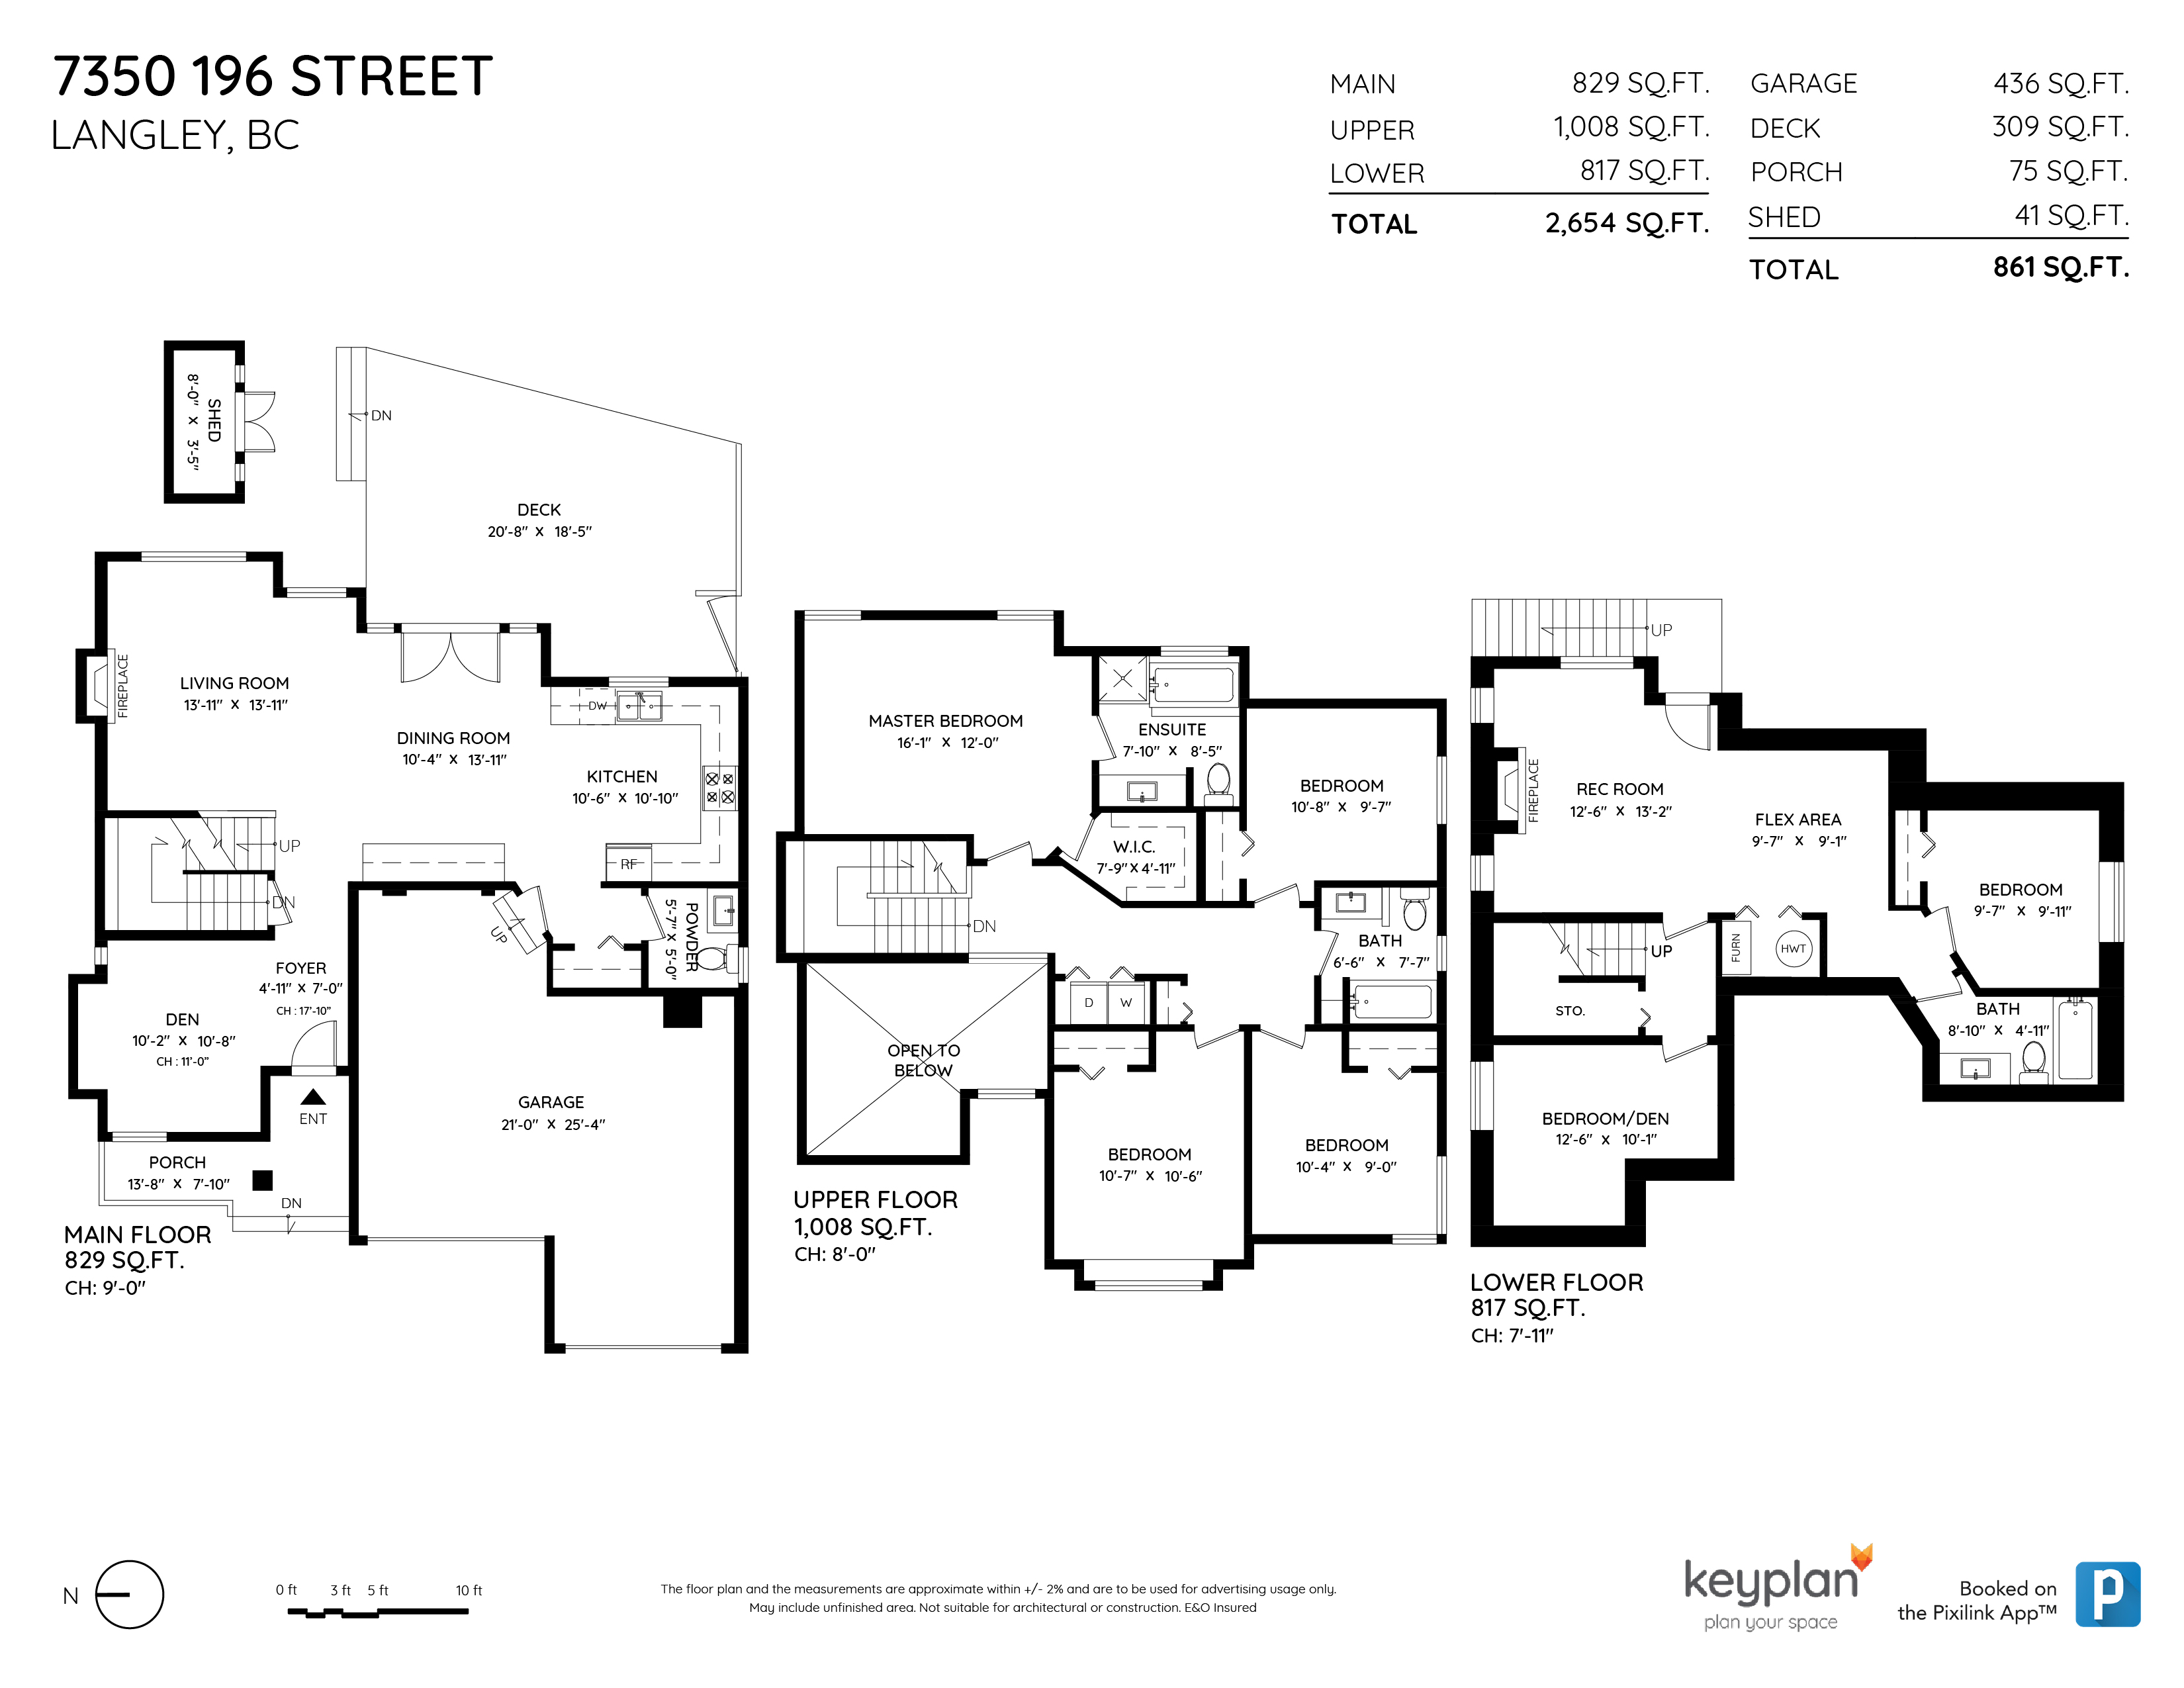 7350 196 STREET, Langley, BC Floor Plan